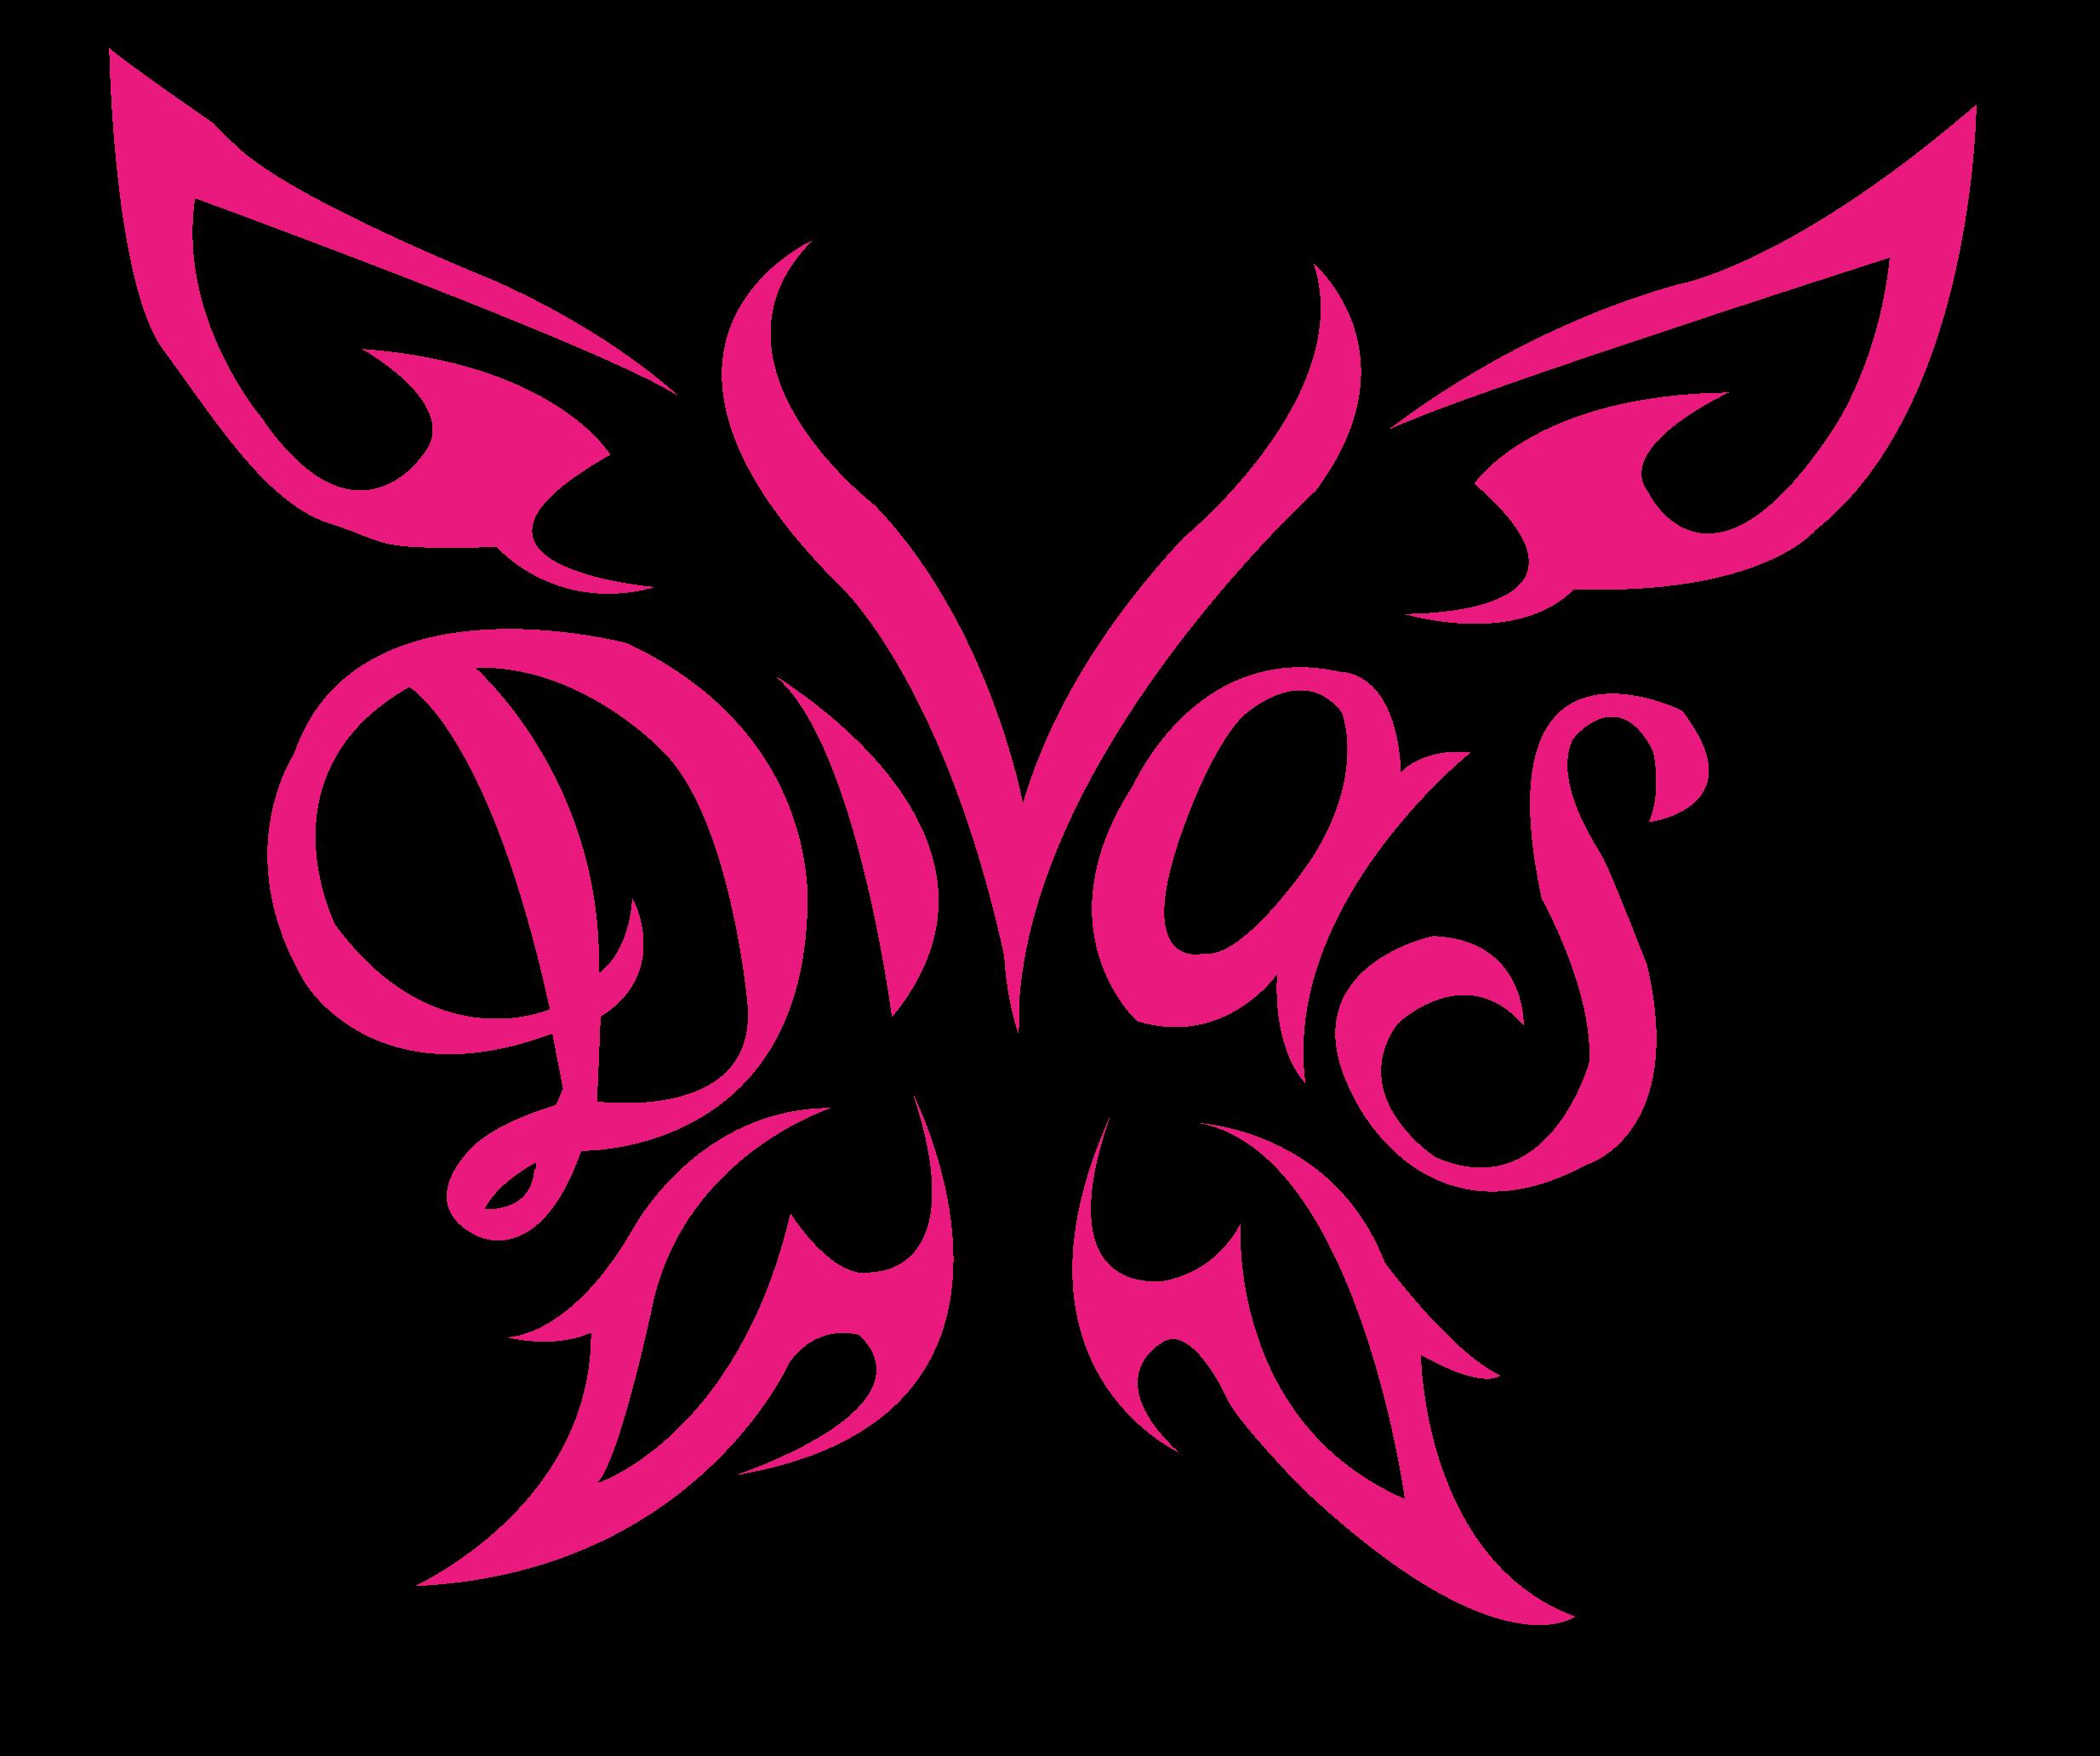 WWE clipart wwe logo Wwe divas logo Pinterest wwe